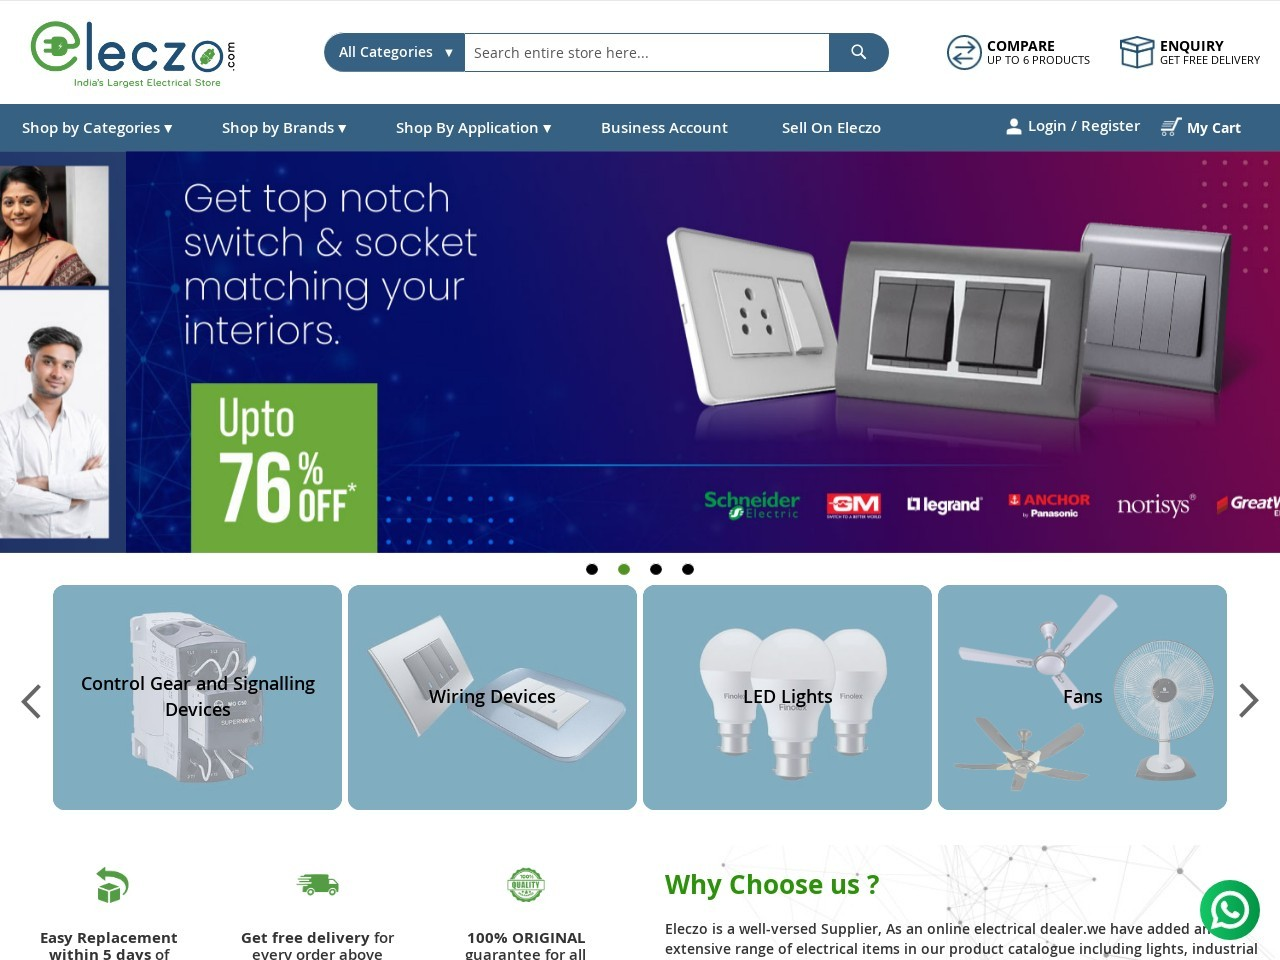 Buy Siemens 5SL64167RC 4 Pole 16 Amp MCB at Online |Eleczo.com